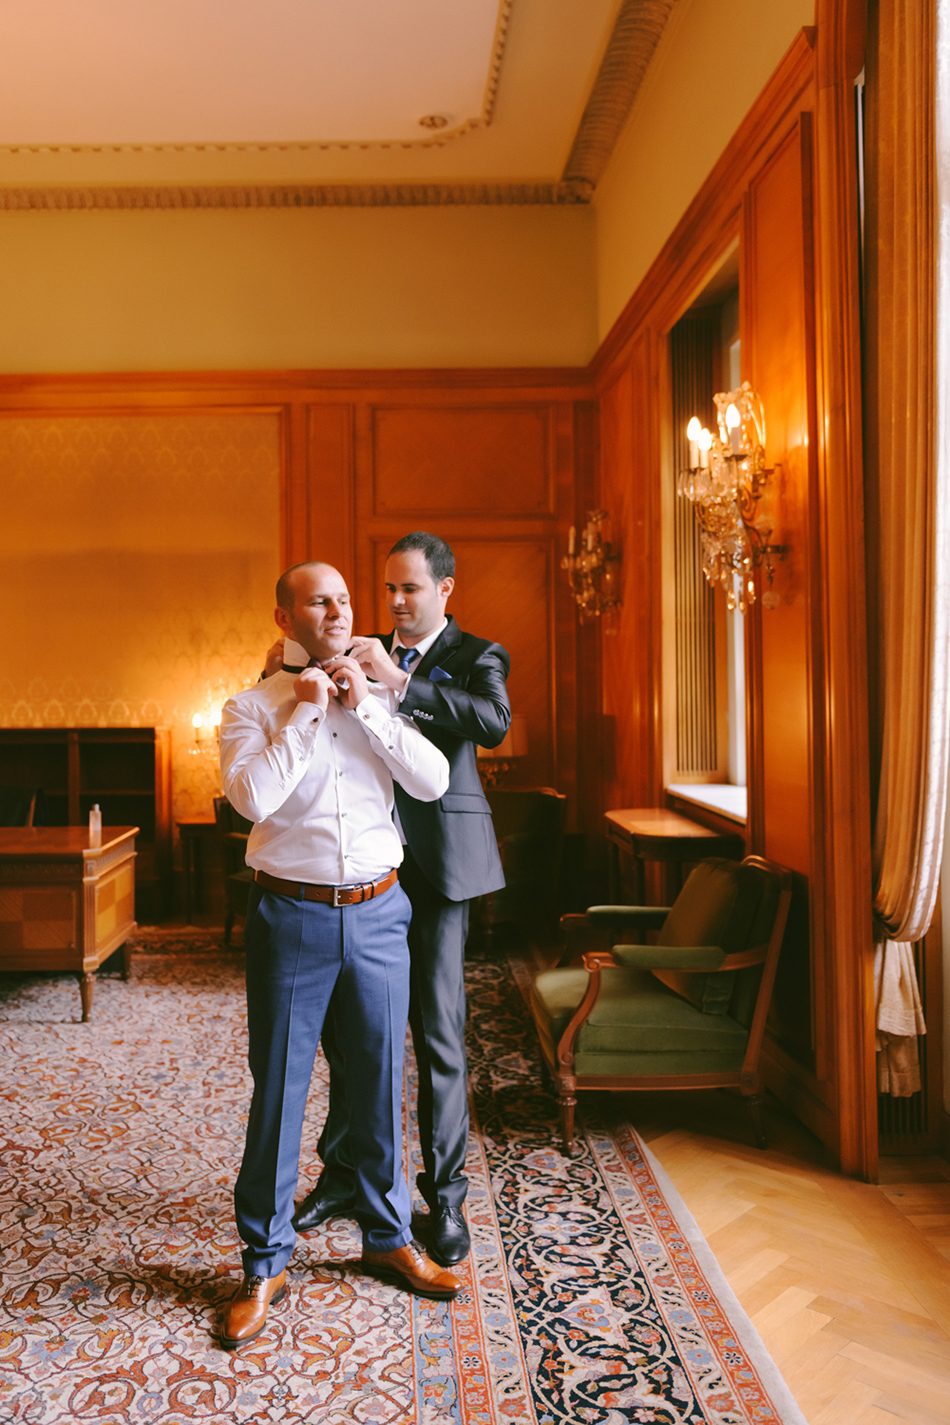 AD Passion Photography | fotograf-nunta-sinaia-flo-oana_0063 | Adelin, Dida, fotograf profesionist, fotograf de nunta, fotografie de nunta, fotograf Timisoara, fotograf Craiova, fotograf Bucuresti, fotograf Arad, nunta Timisoara, nunta Arad, nunta Bucuresti, nunta Craiova